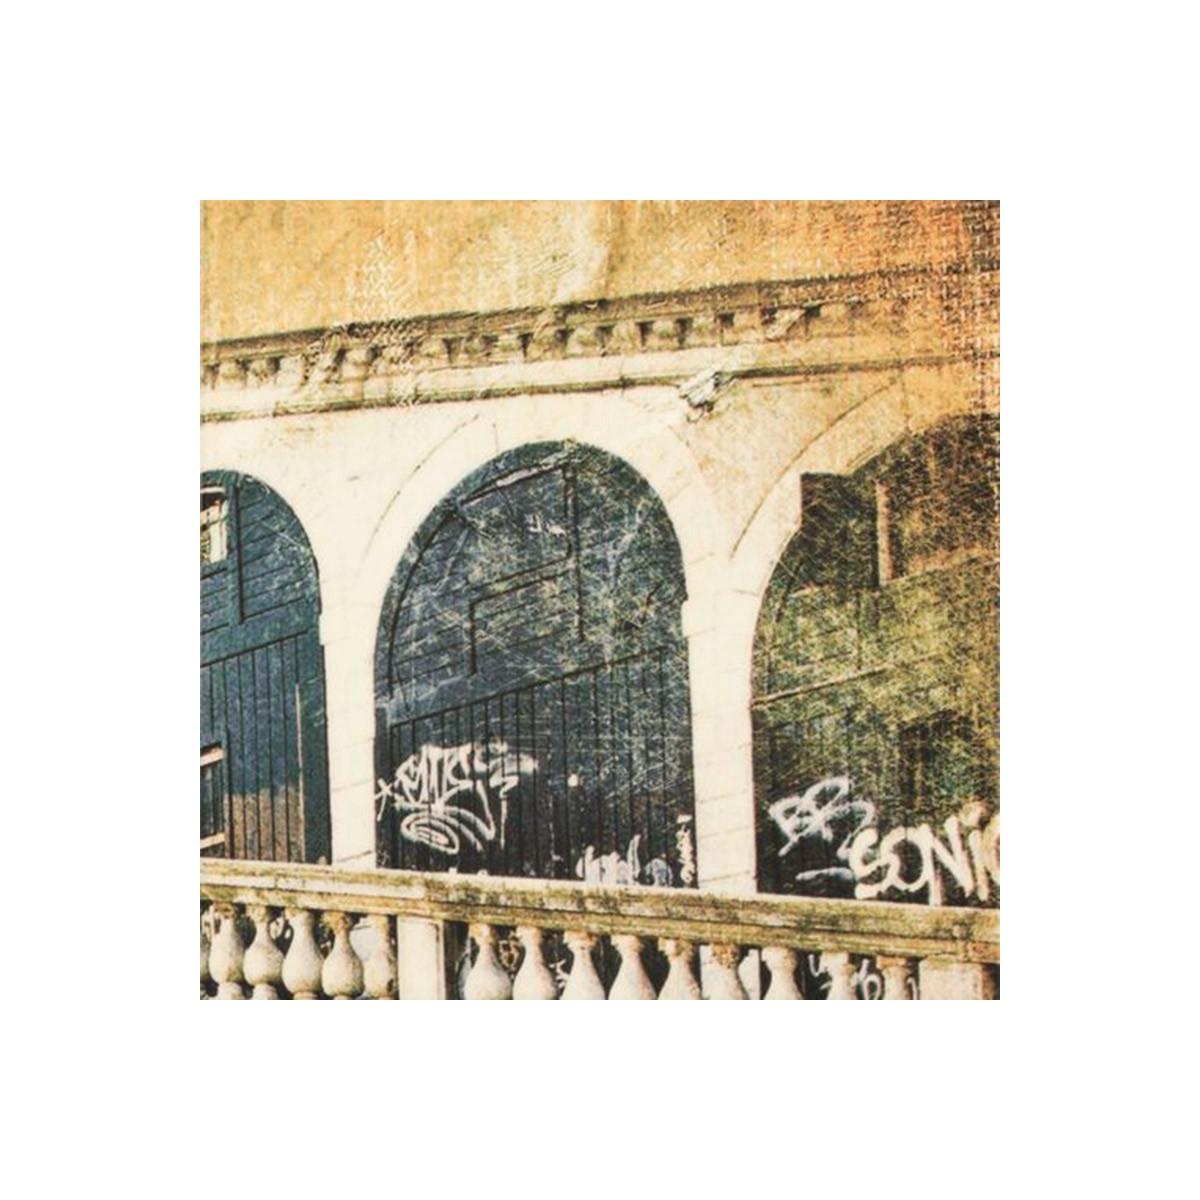 Conjunto Venecia - Milano Decor de Mainzu - Marca Mainzu